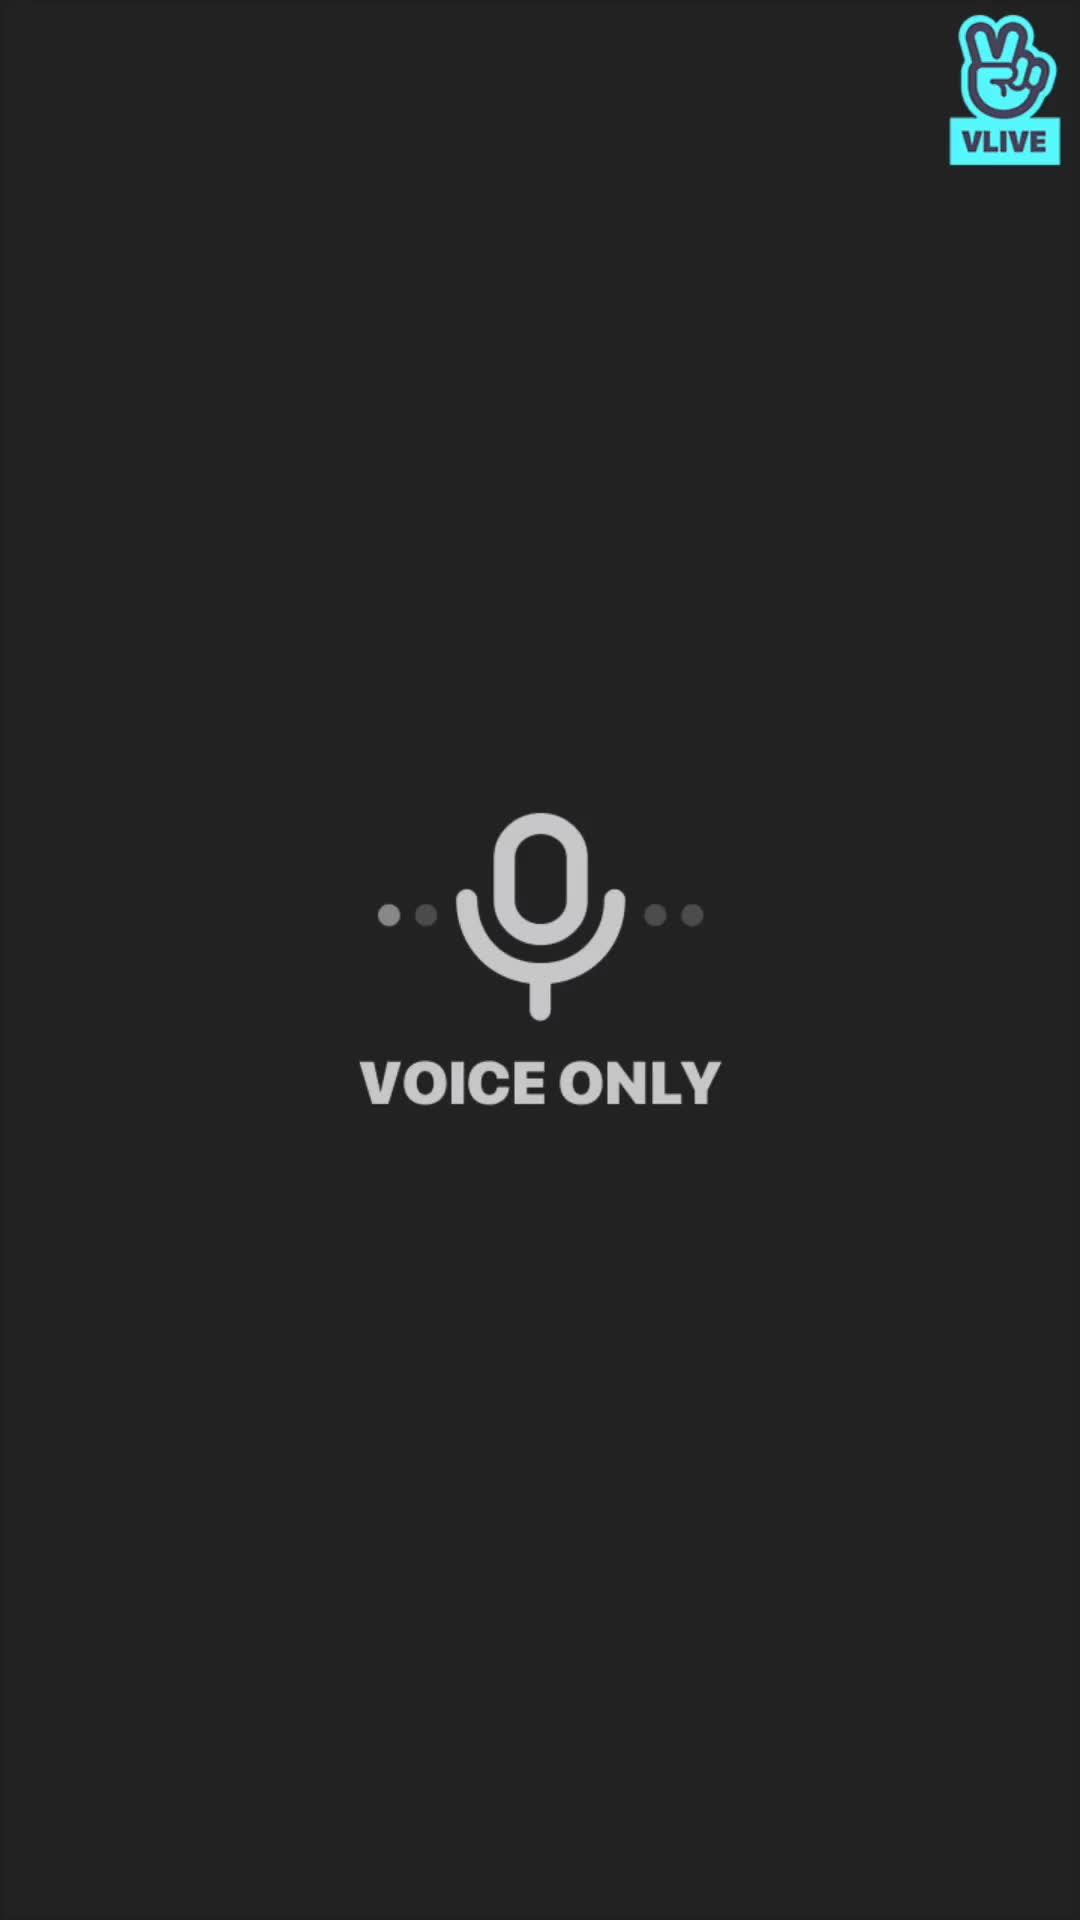 [RADIO] 캐럿들 귀대귀대#79 따뜻한 우유한잔